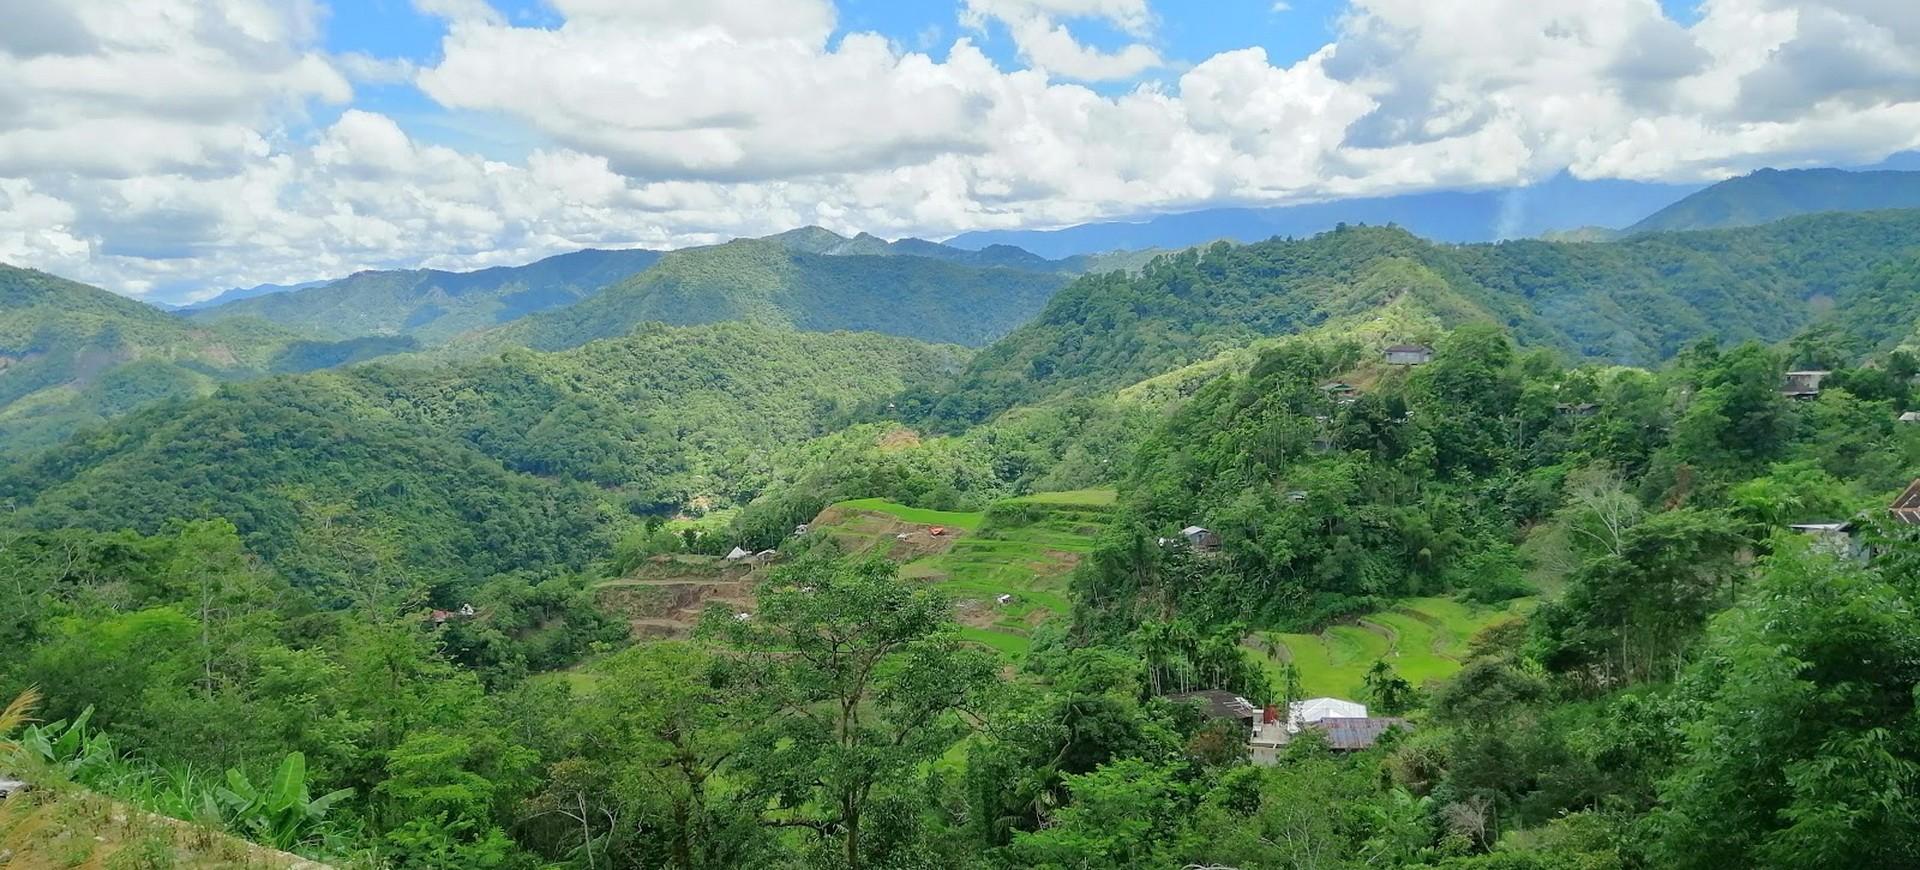 Philippines Kinakin région montagneuse